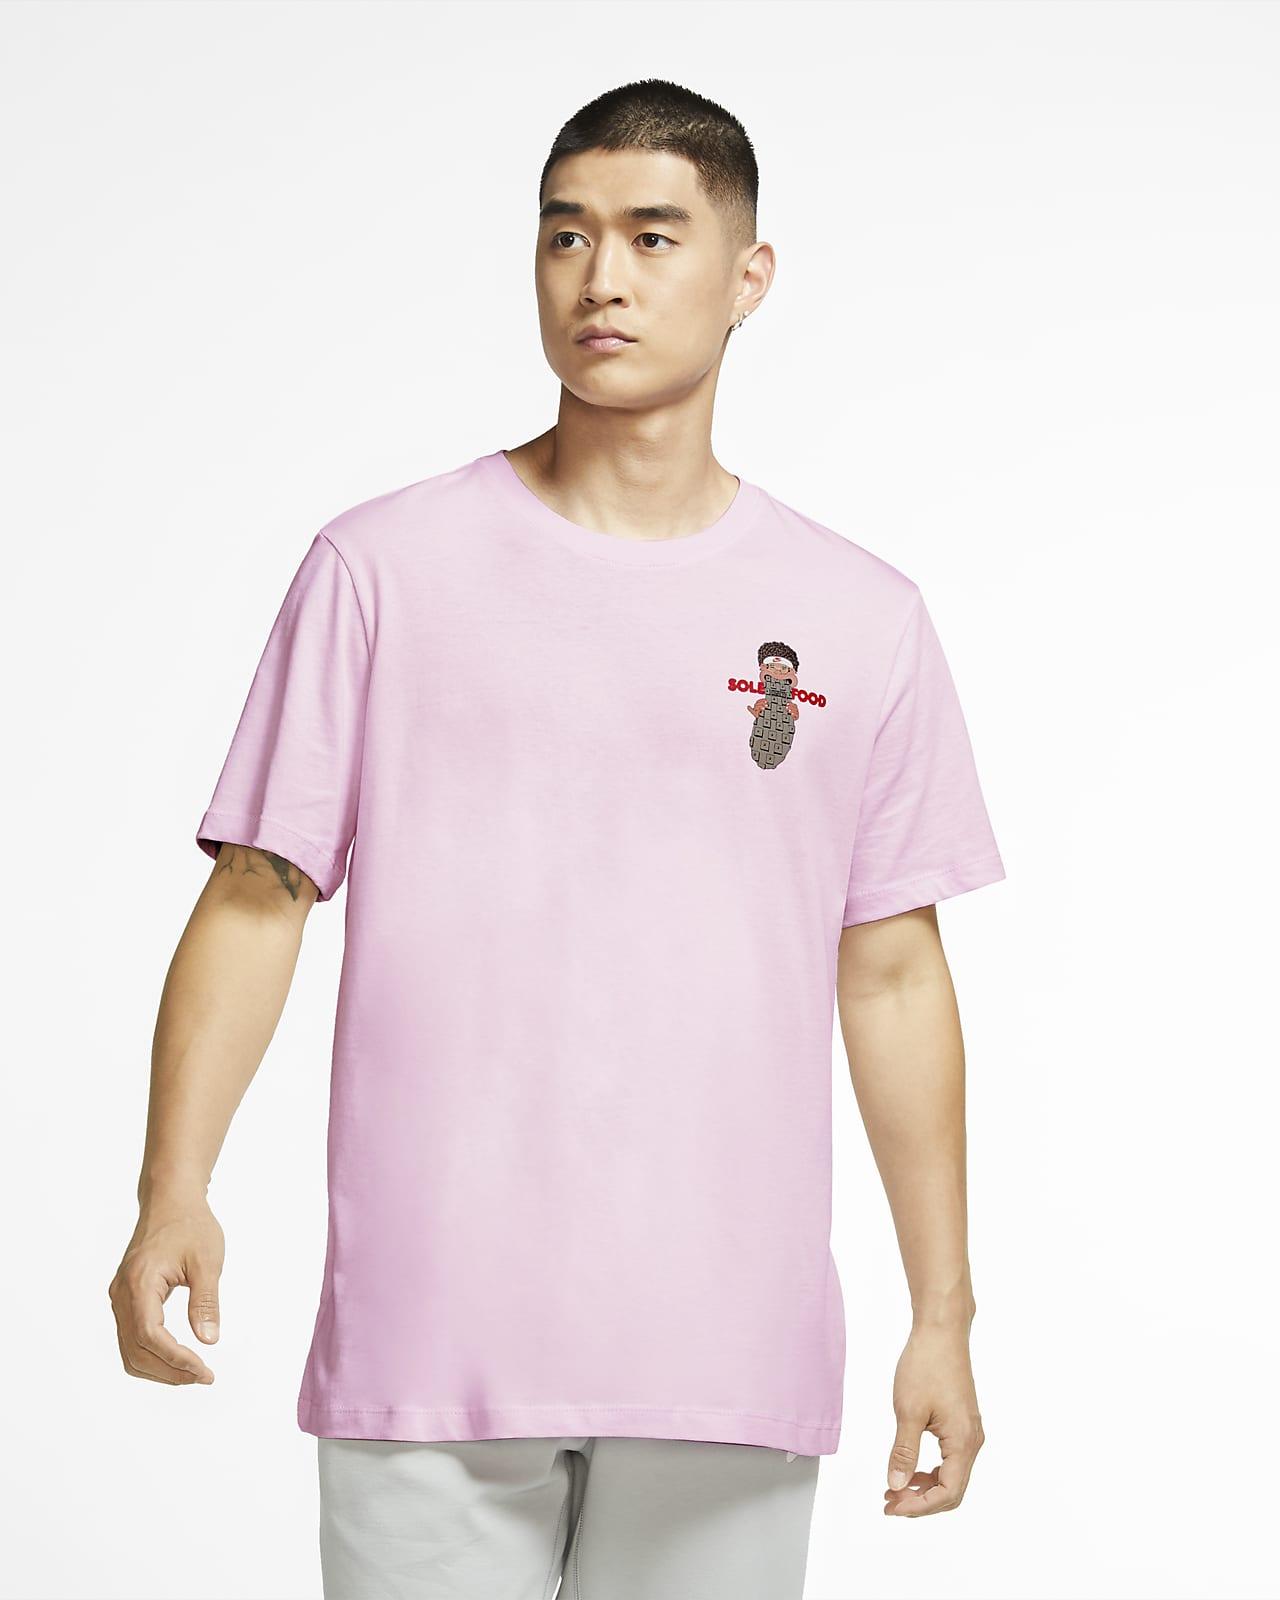 T-shirt Nike Sportswear - Uomo